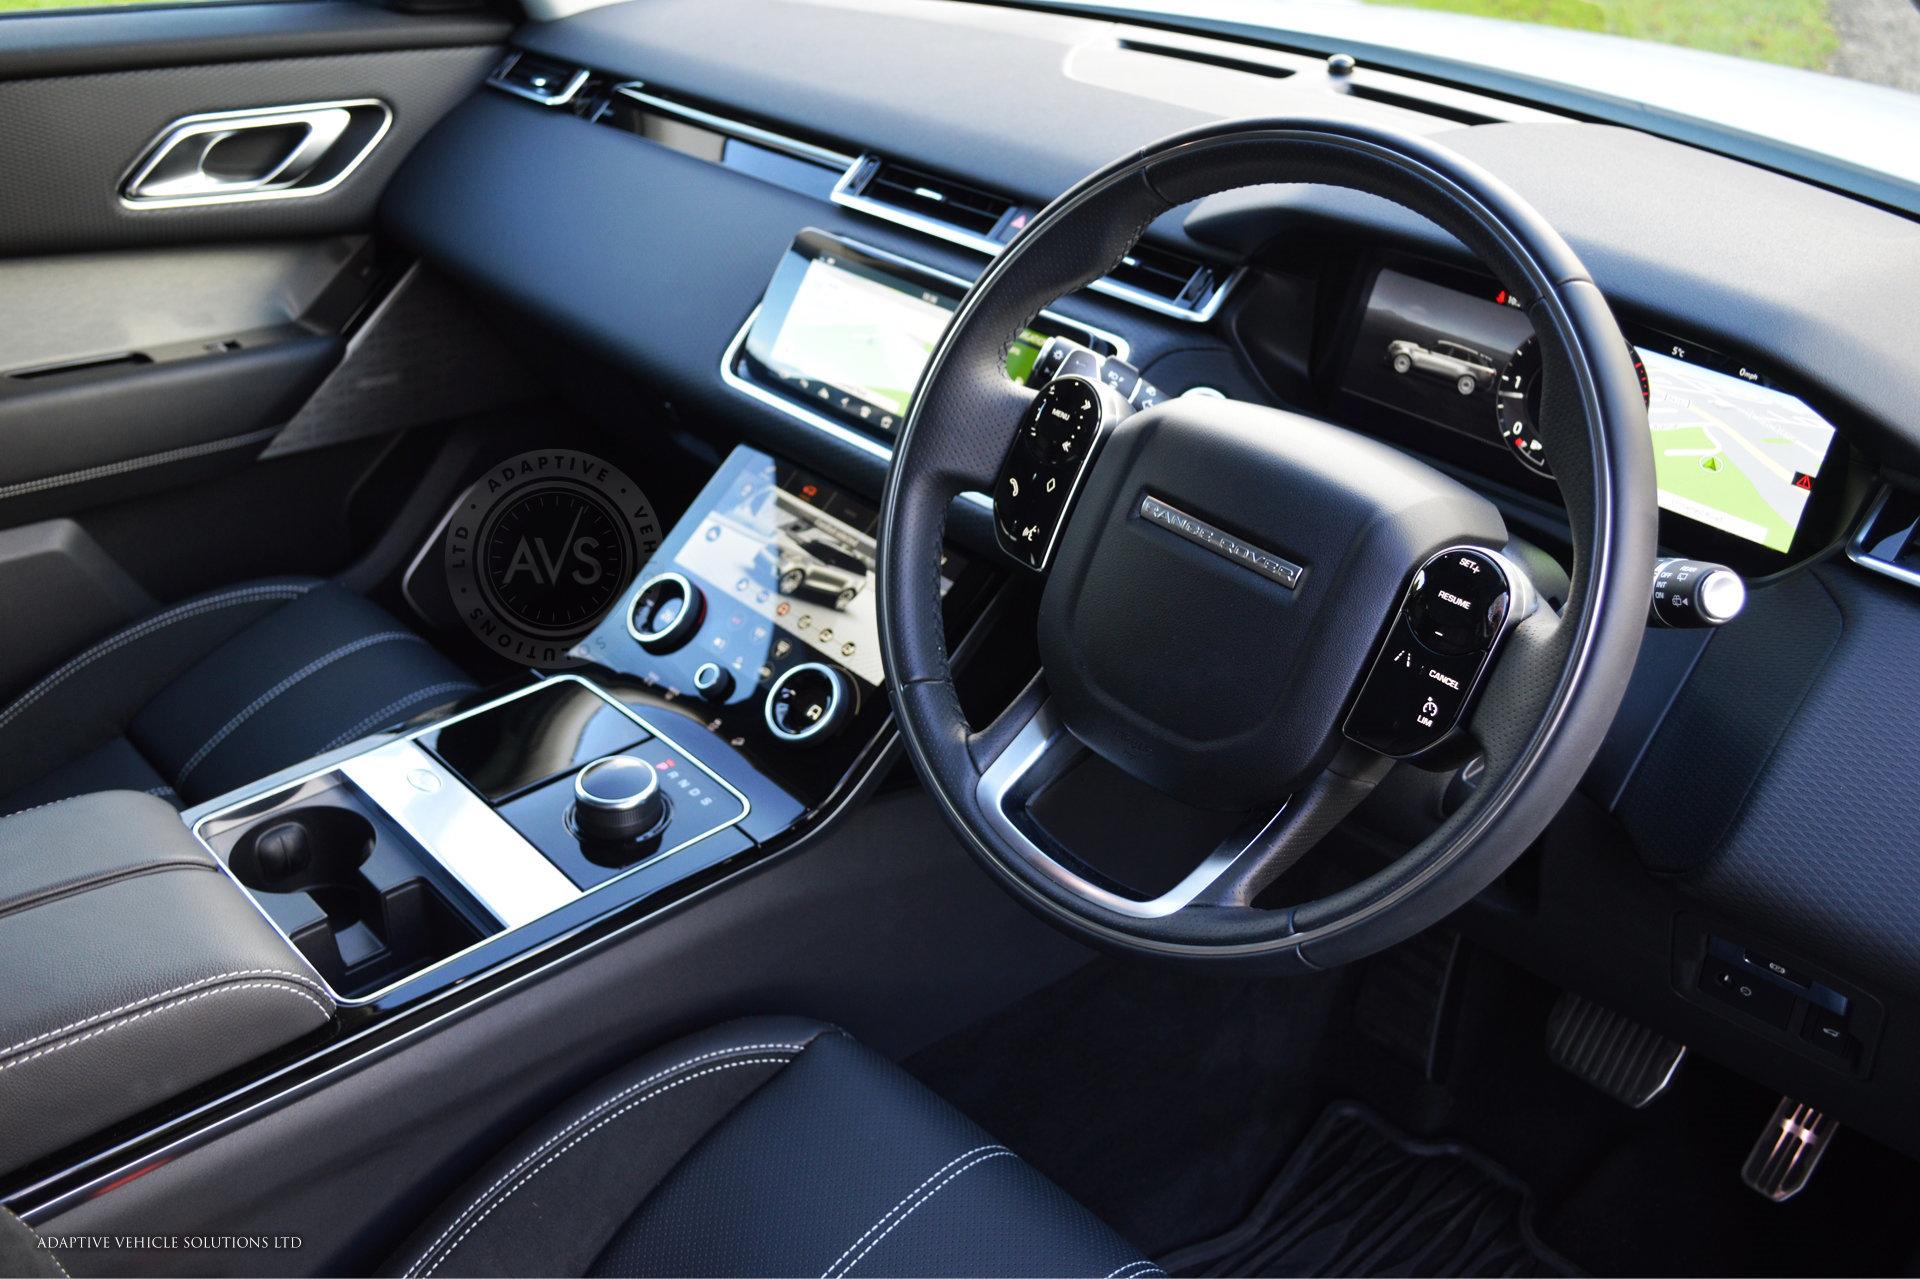 Land Rover Incontrol Apps >> Range Rover Velar R-Dynamic SE White – 01 | Adaptive Vehicle Solutions Ltd